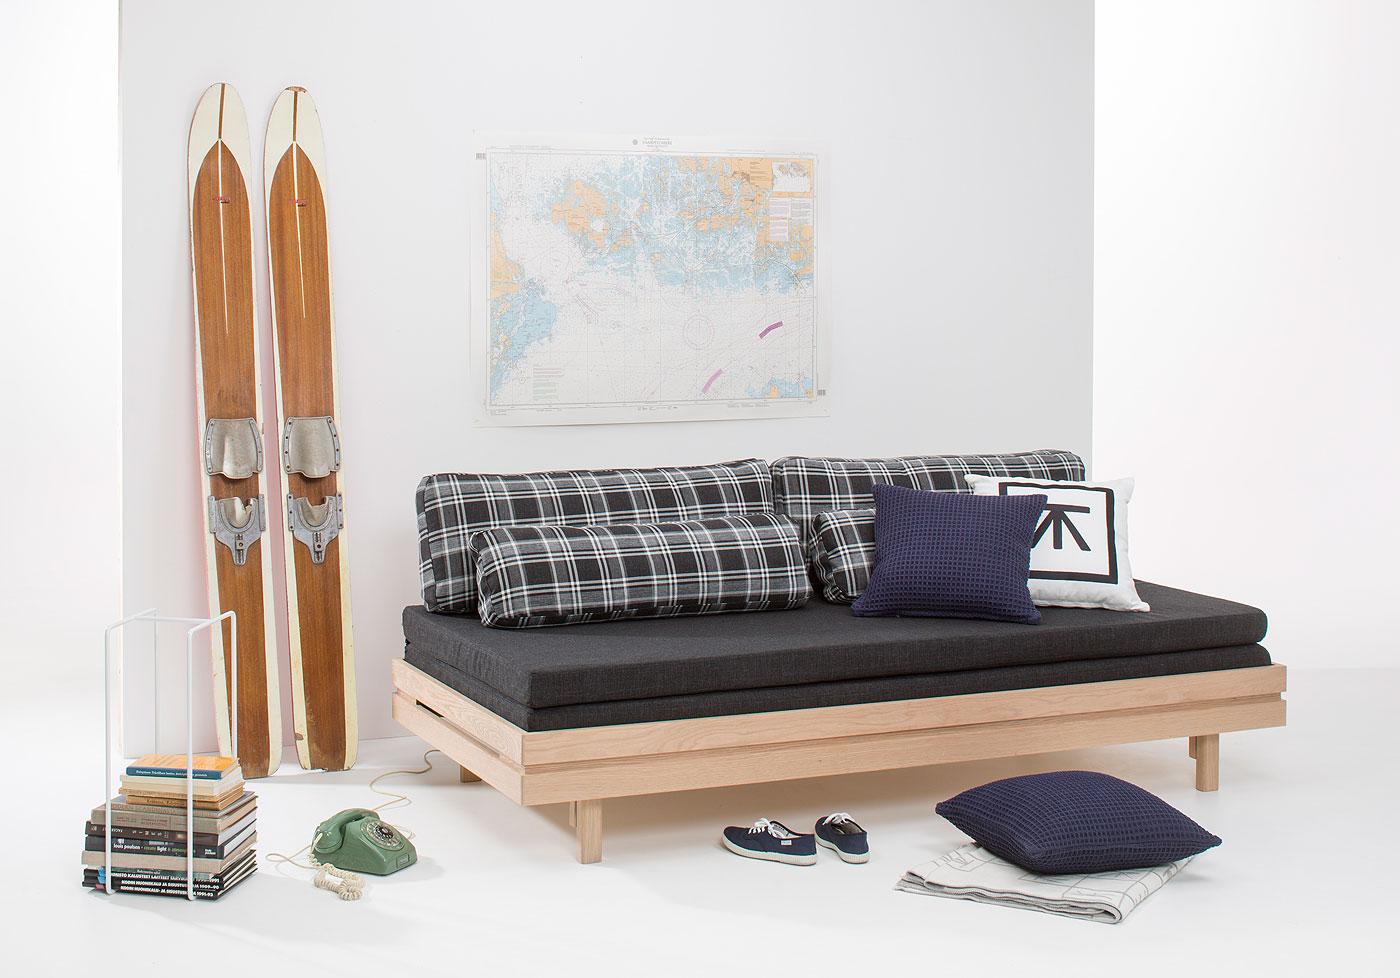 Juvenil sof cama del dise ador finland s tapio anttila - Sofa cama juvenil ...